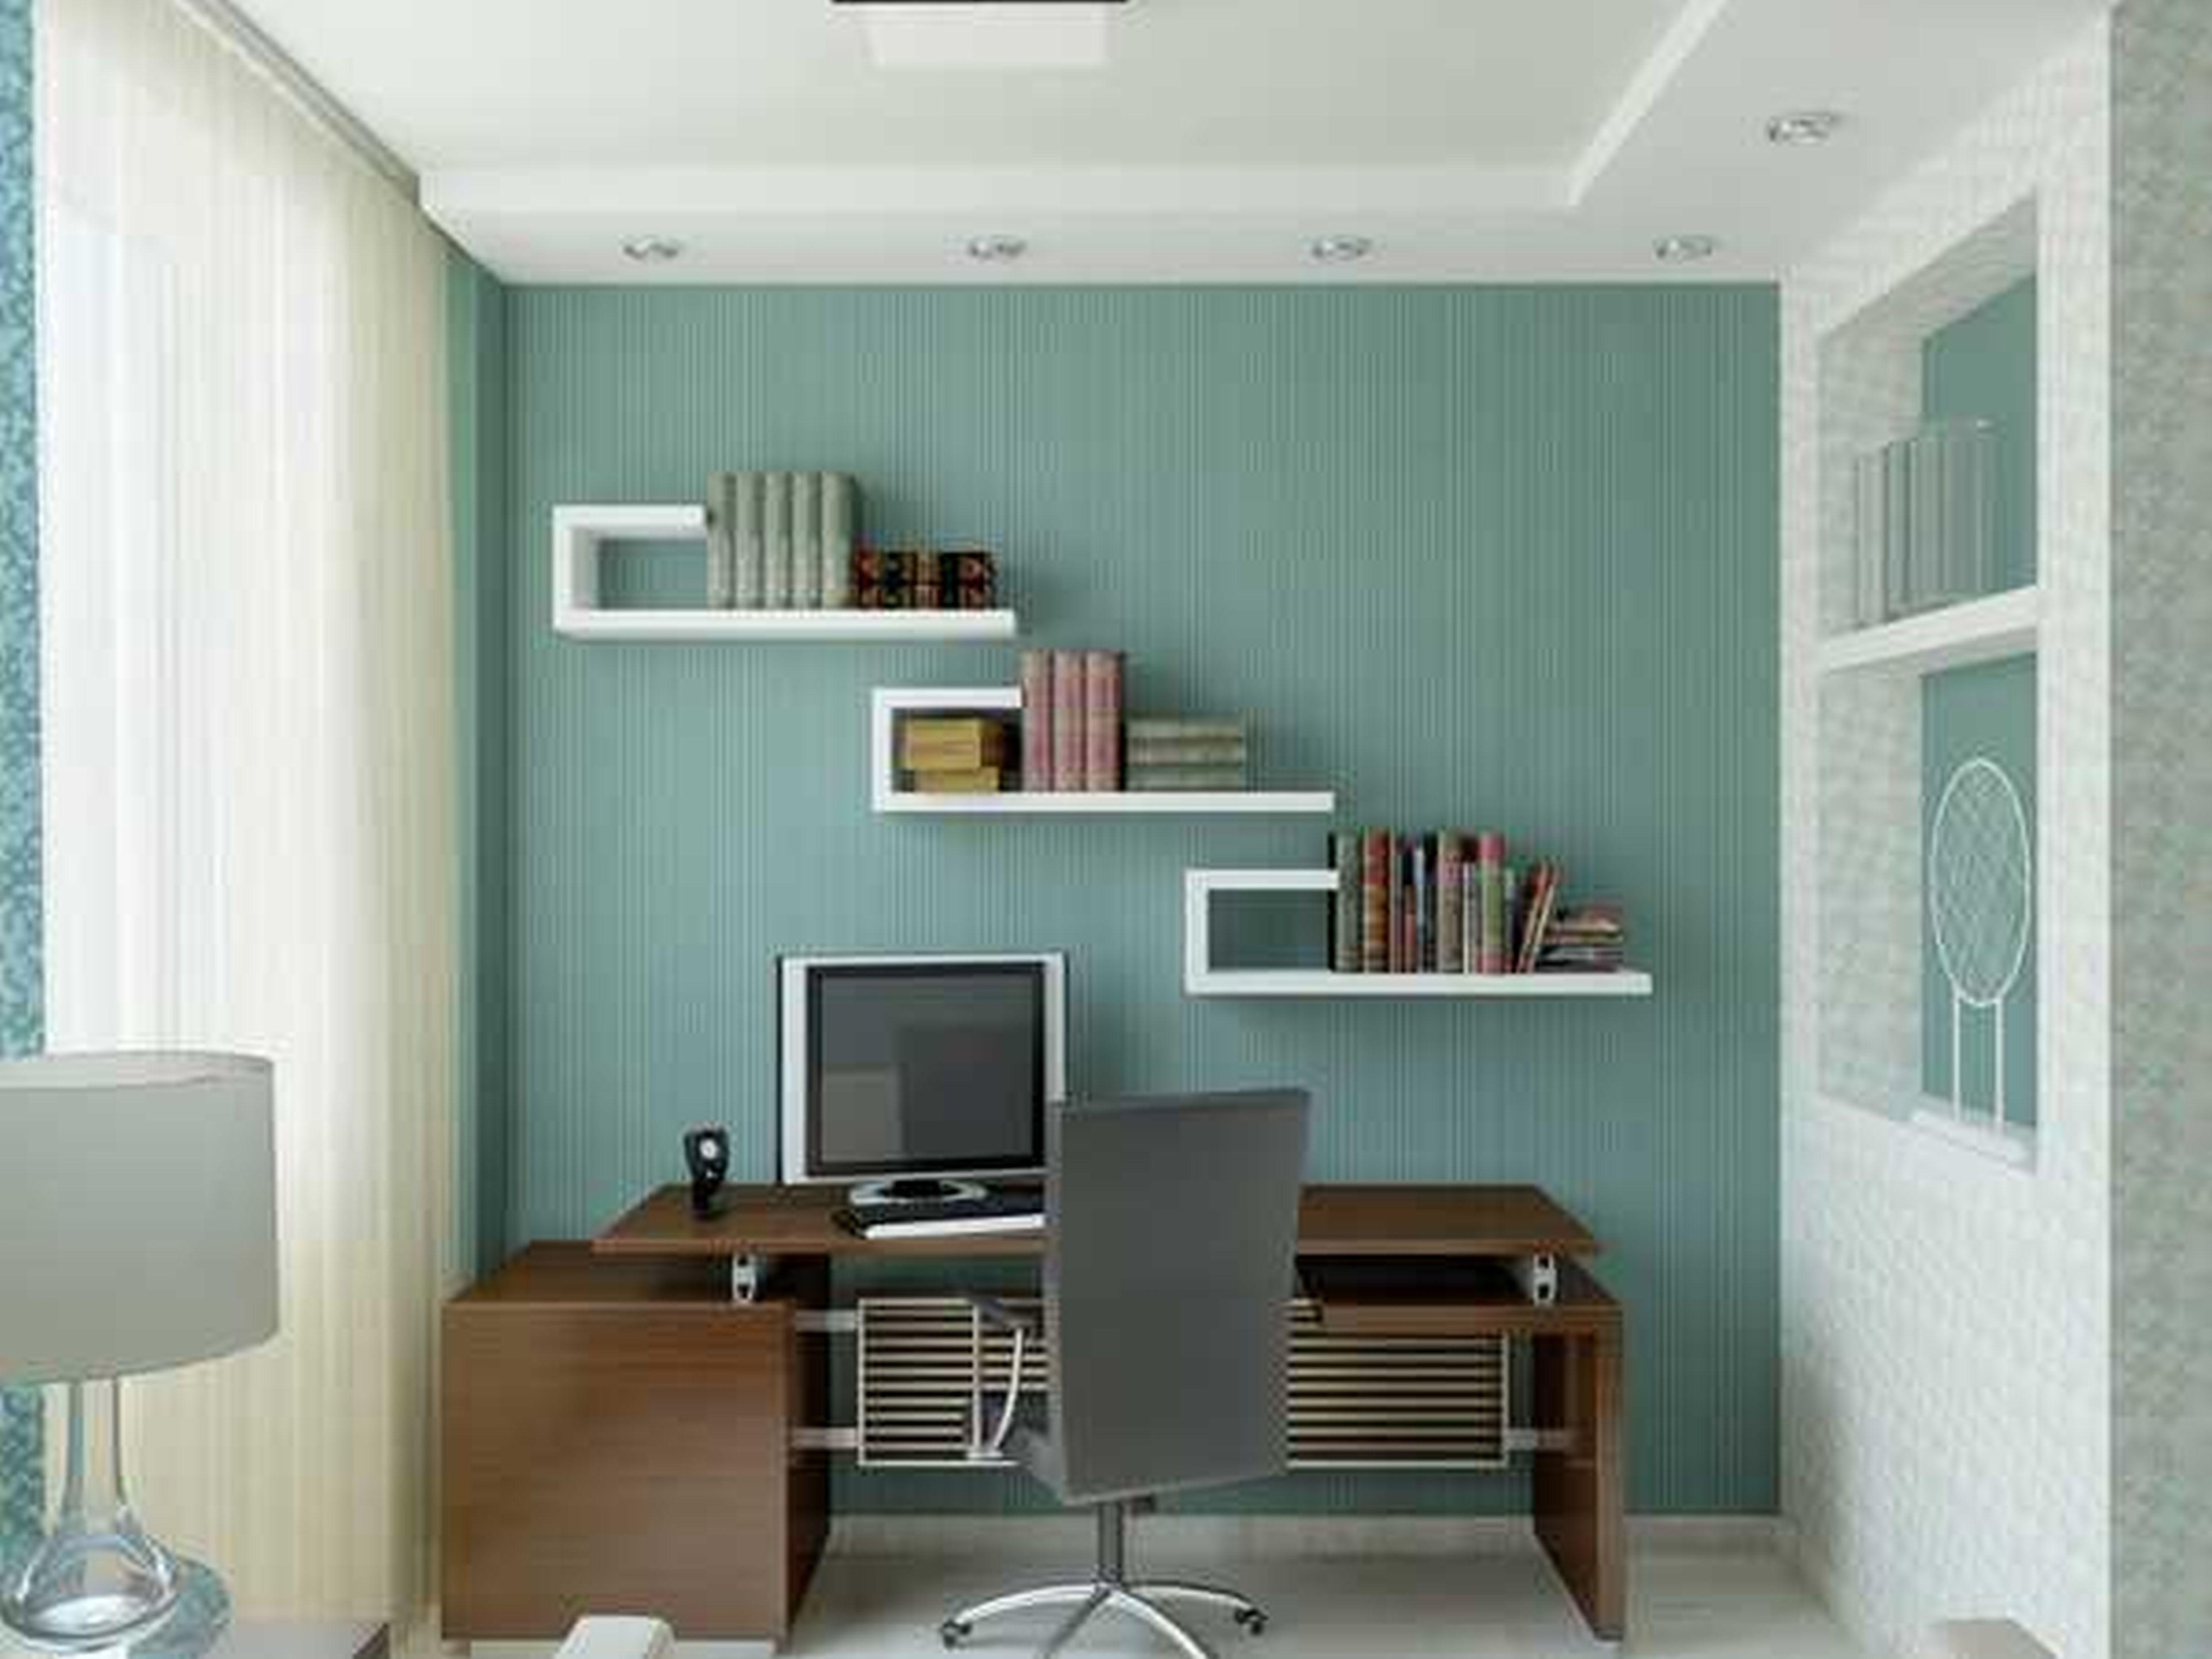 Office Room Design Gallery Ivchic Design Office Room Plain Inside